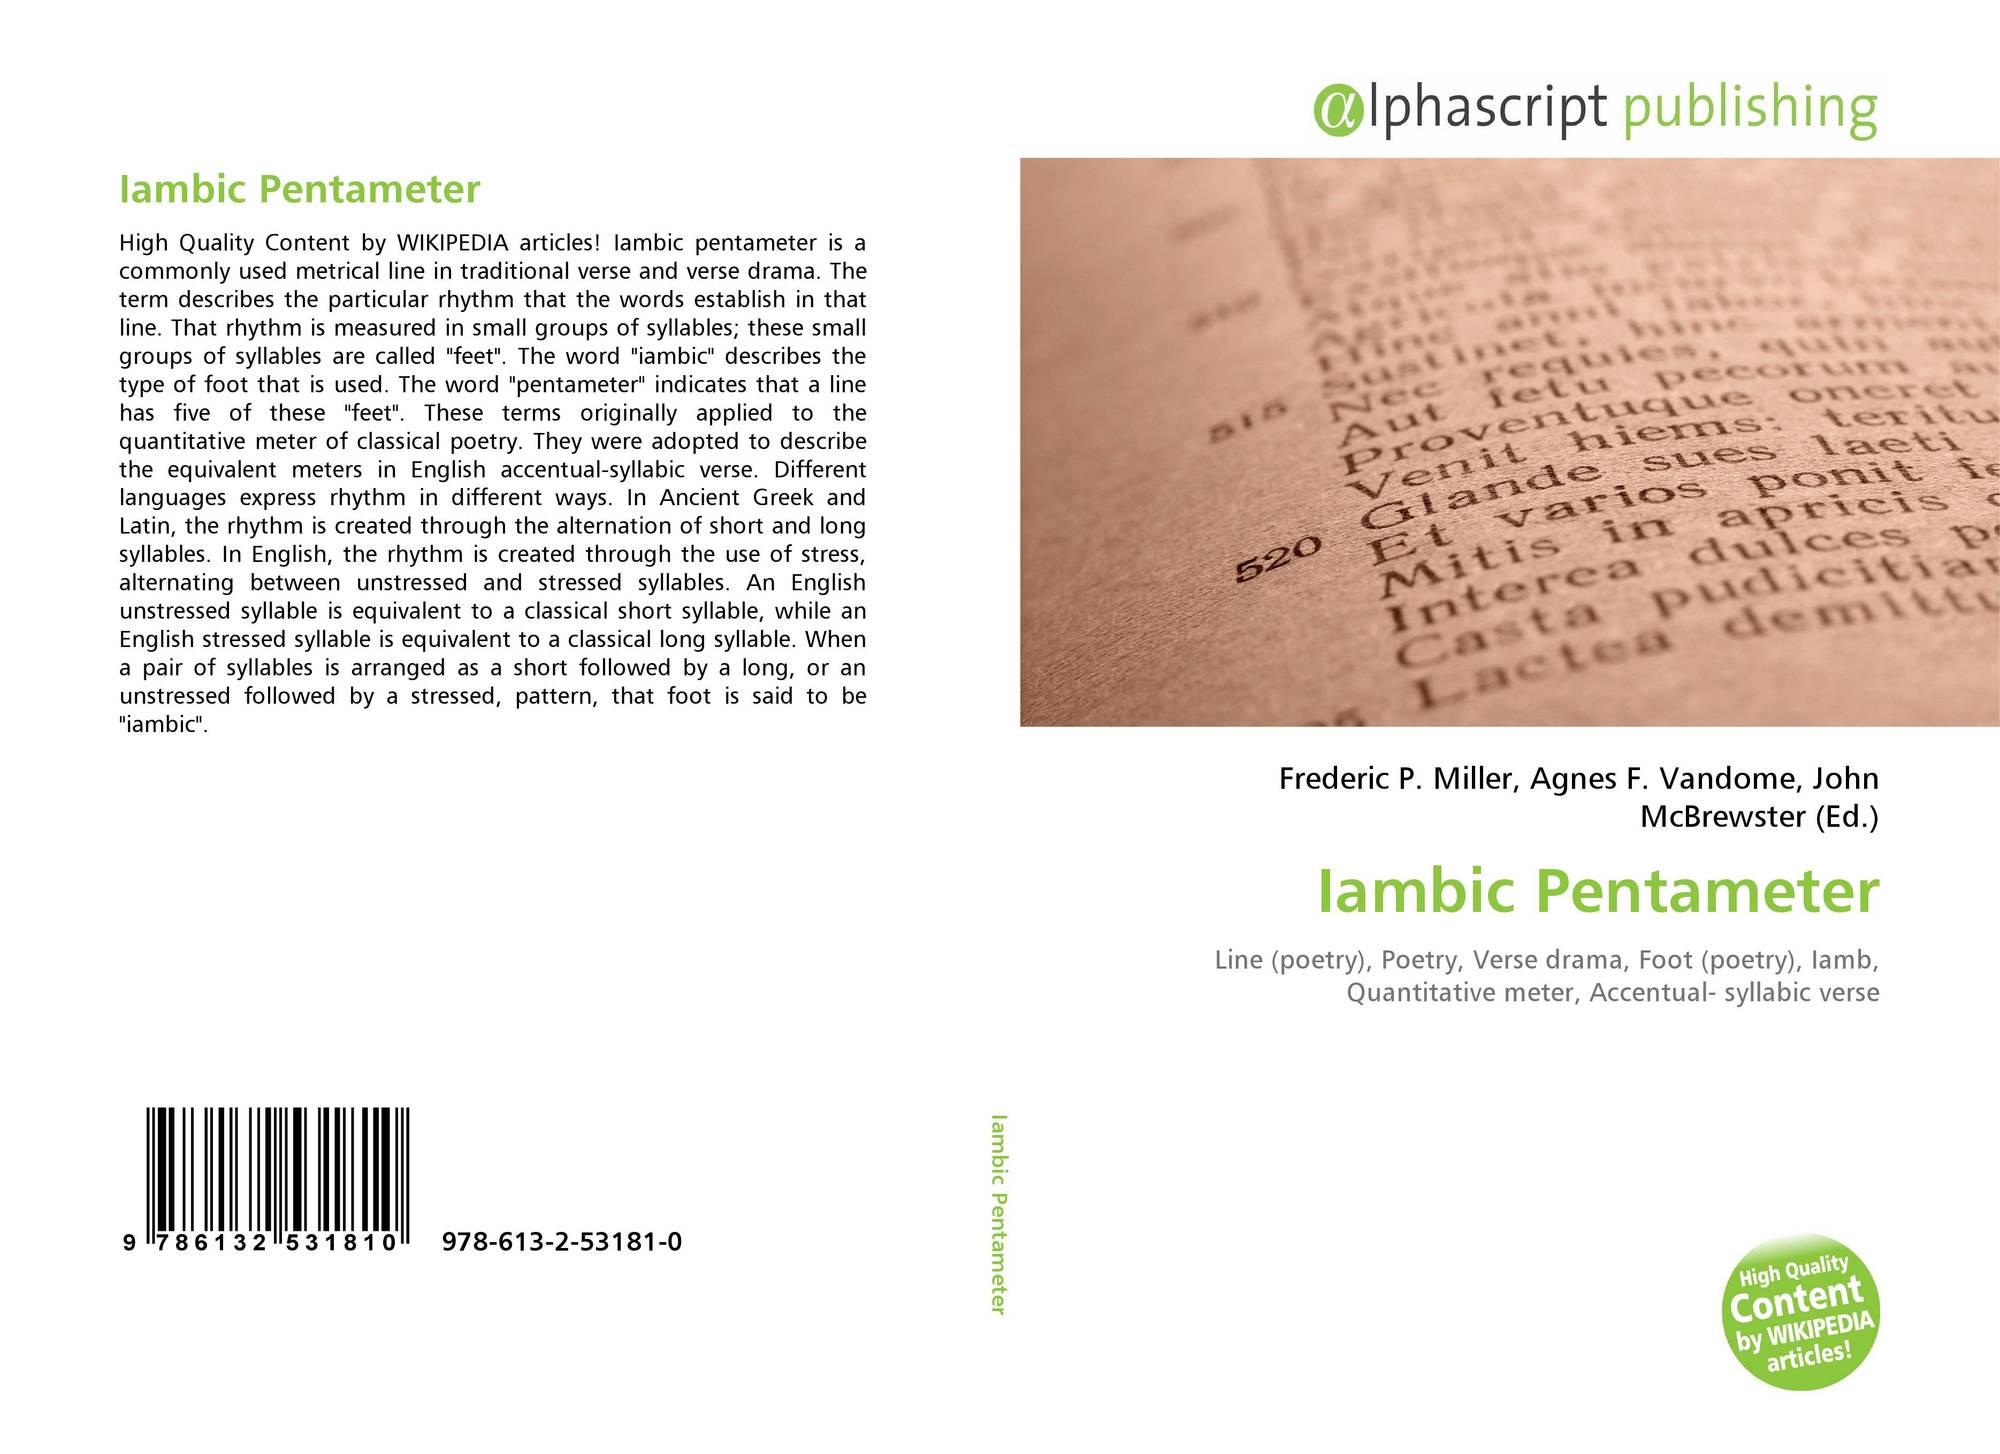 Iambic Pentameter 978 613 2 53181 0 6132531815 9786132531810